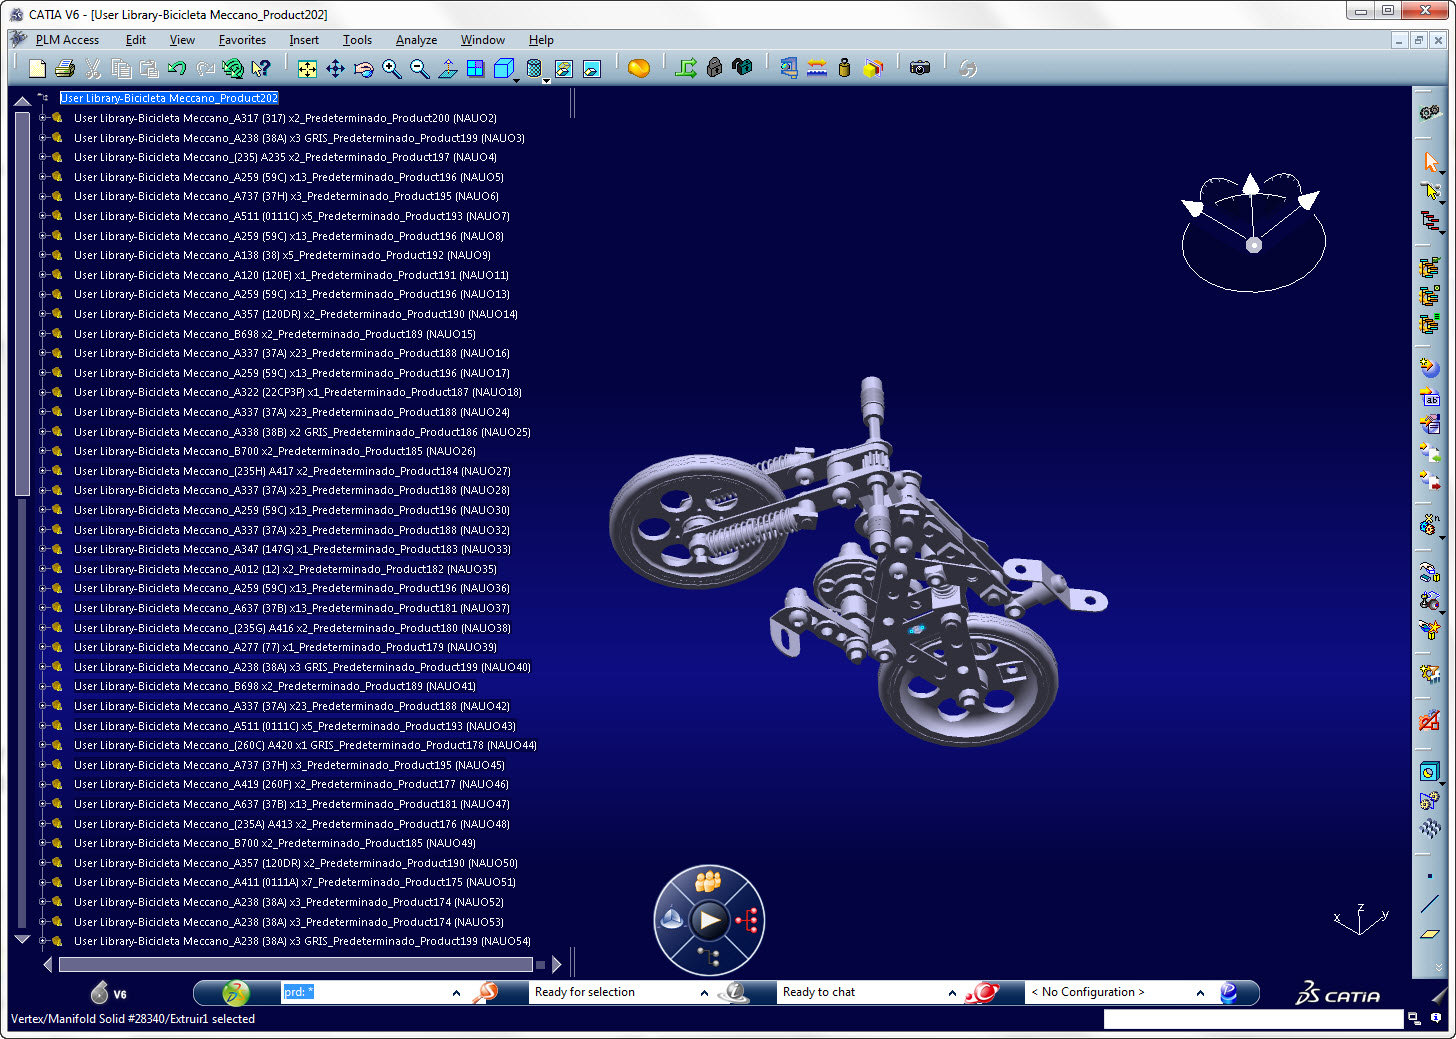 CATIA V6 im Blue Layer